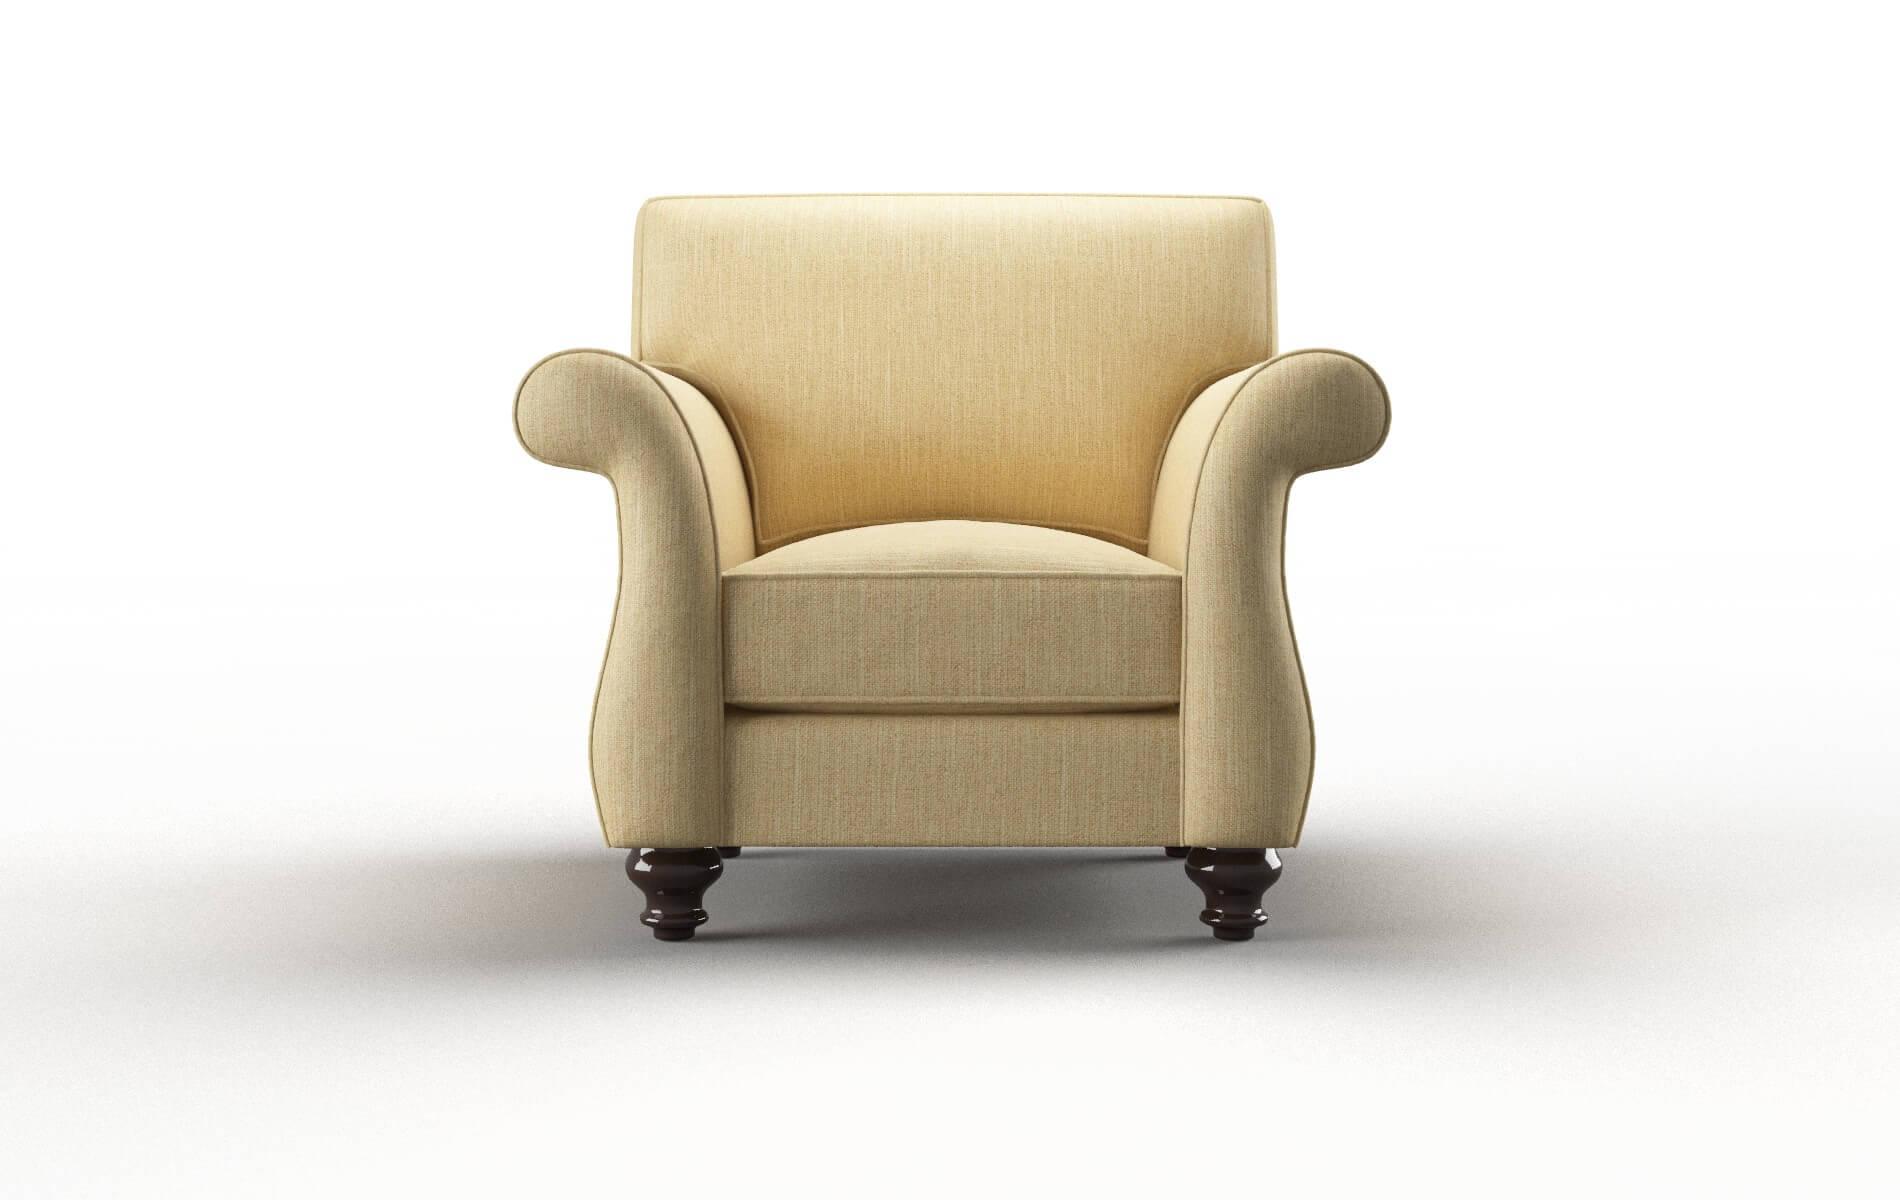 Pisa Malibu Maize Chair espresso legs 1